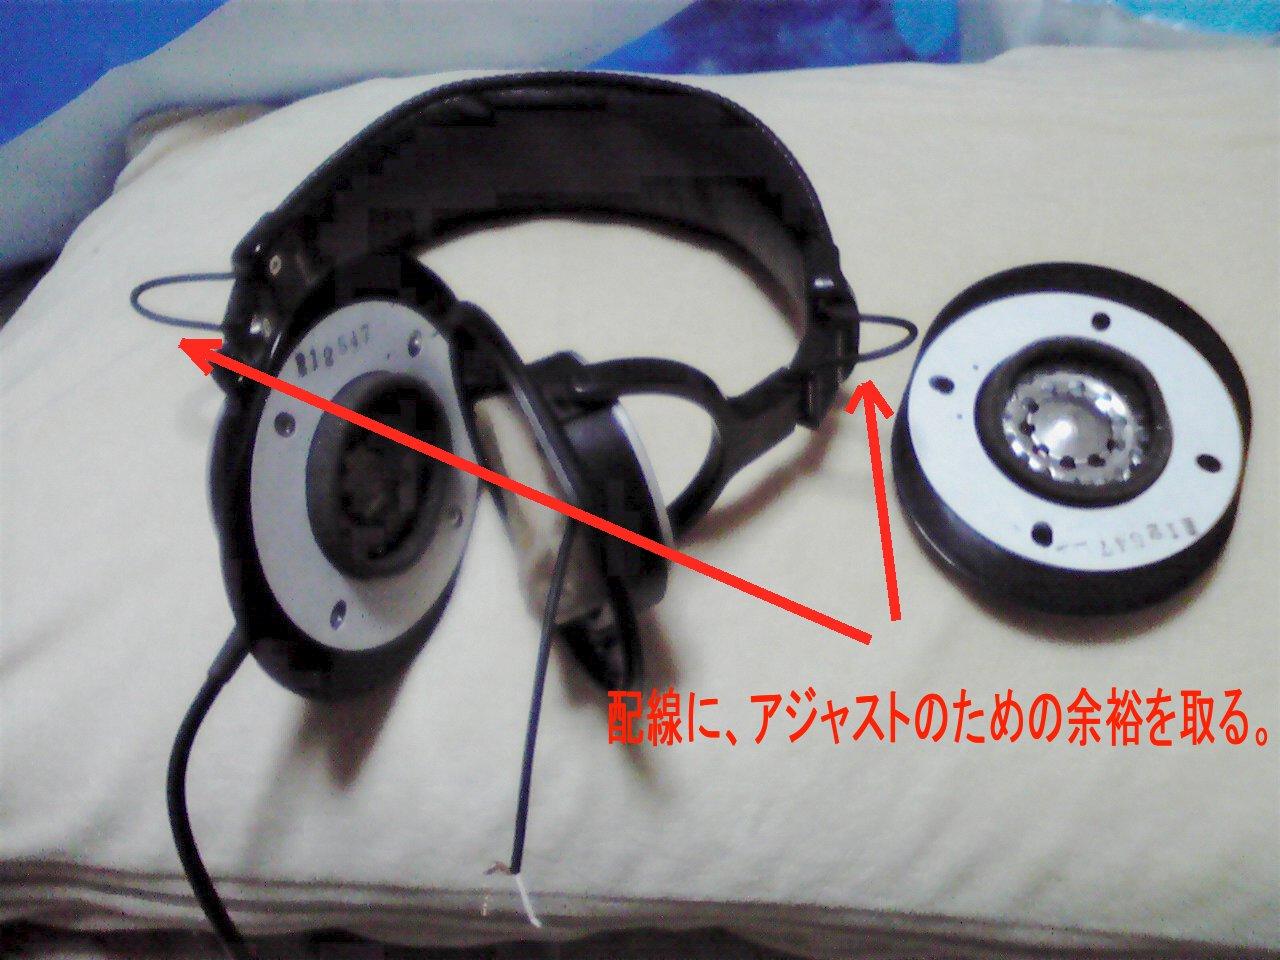 MDR-CD900ST R断線lリケーブル10